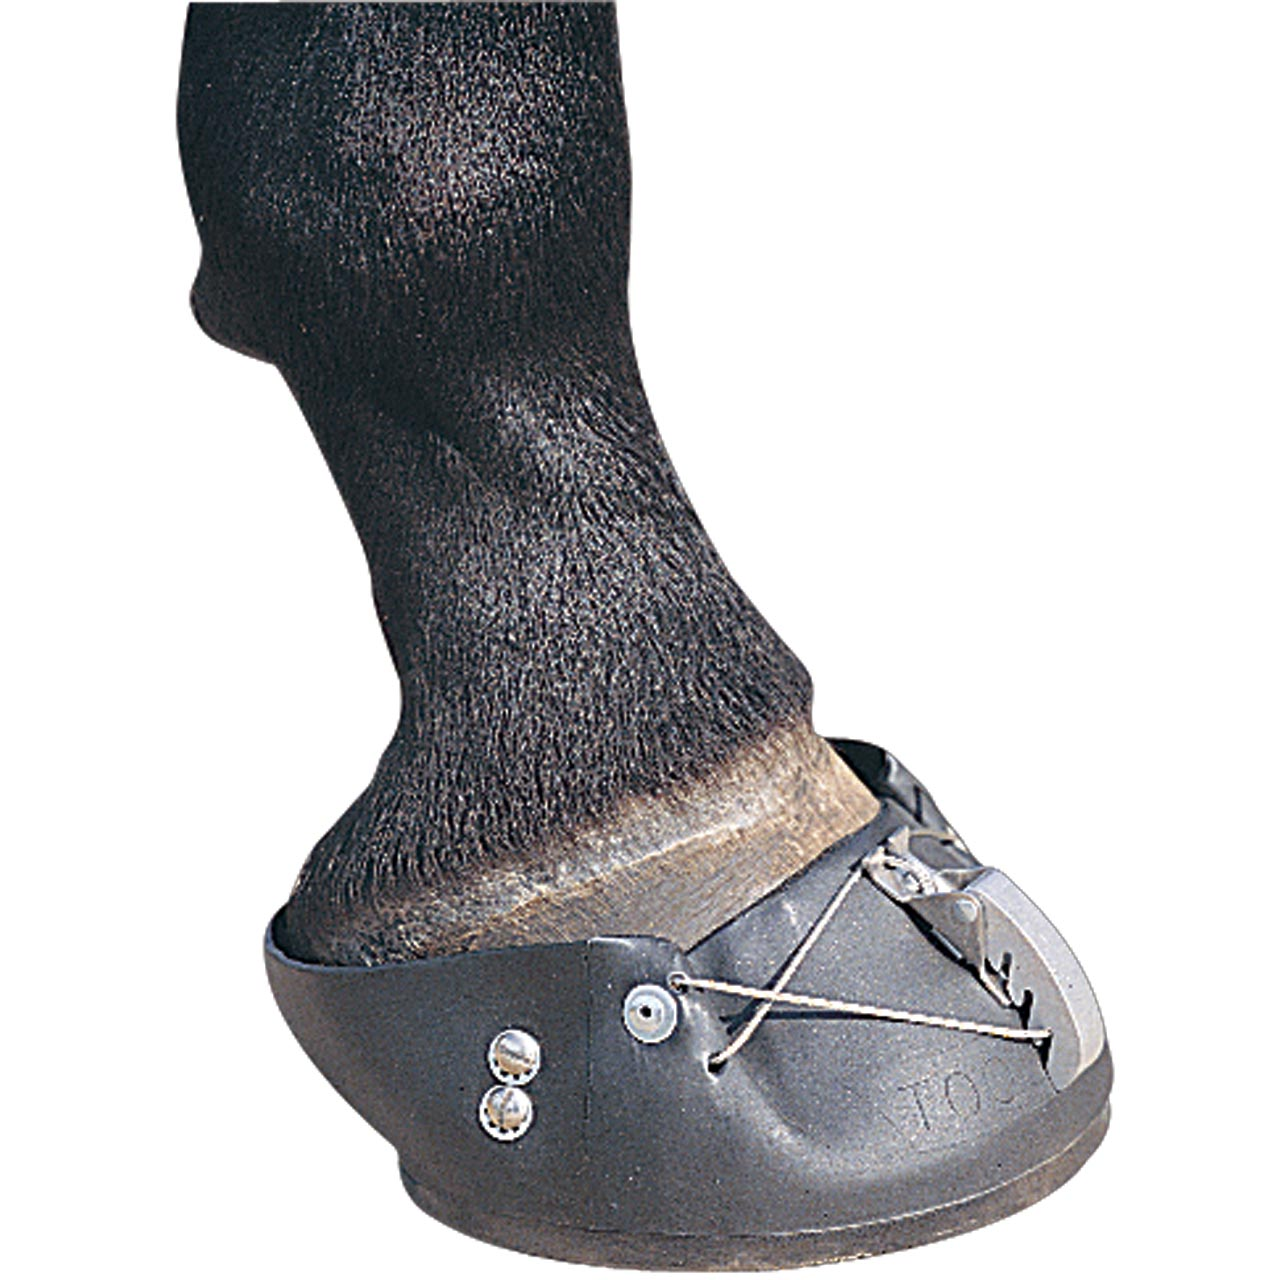 Easy boot